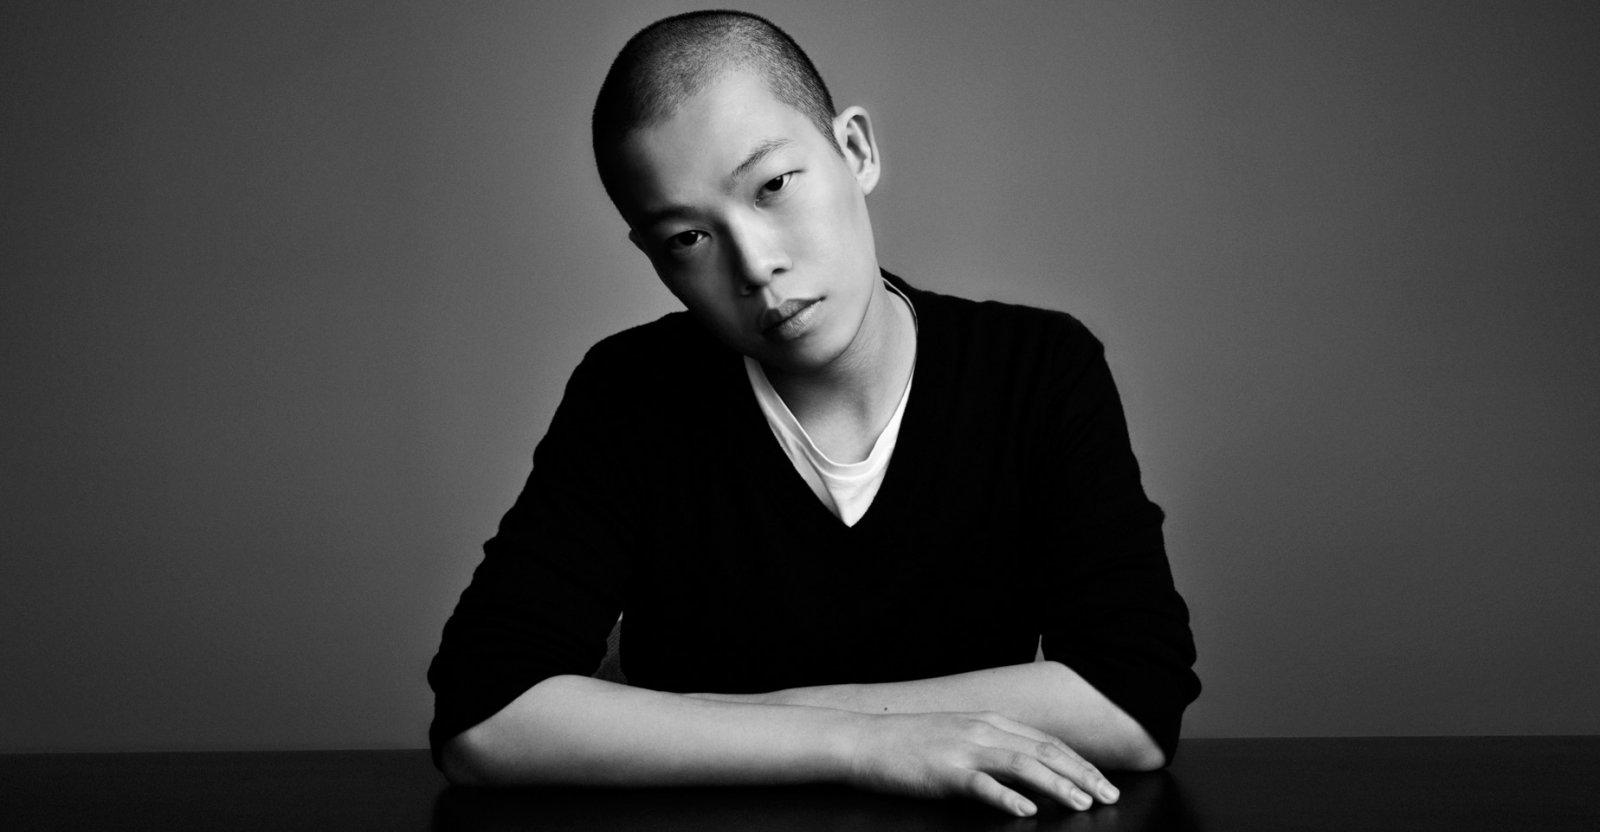 Jason Wu biographie